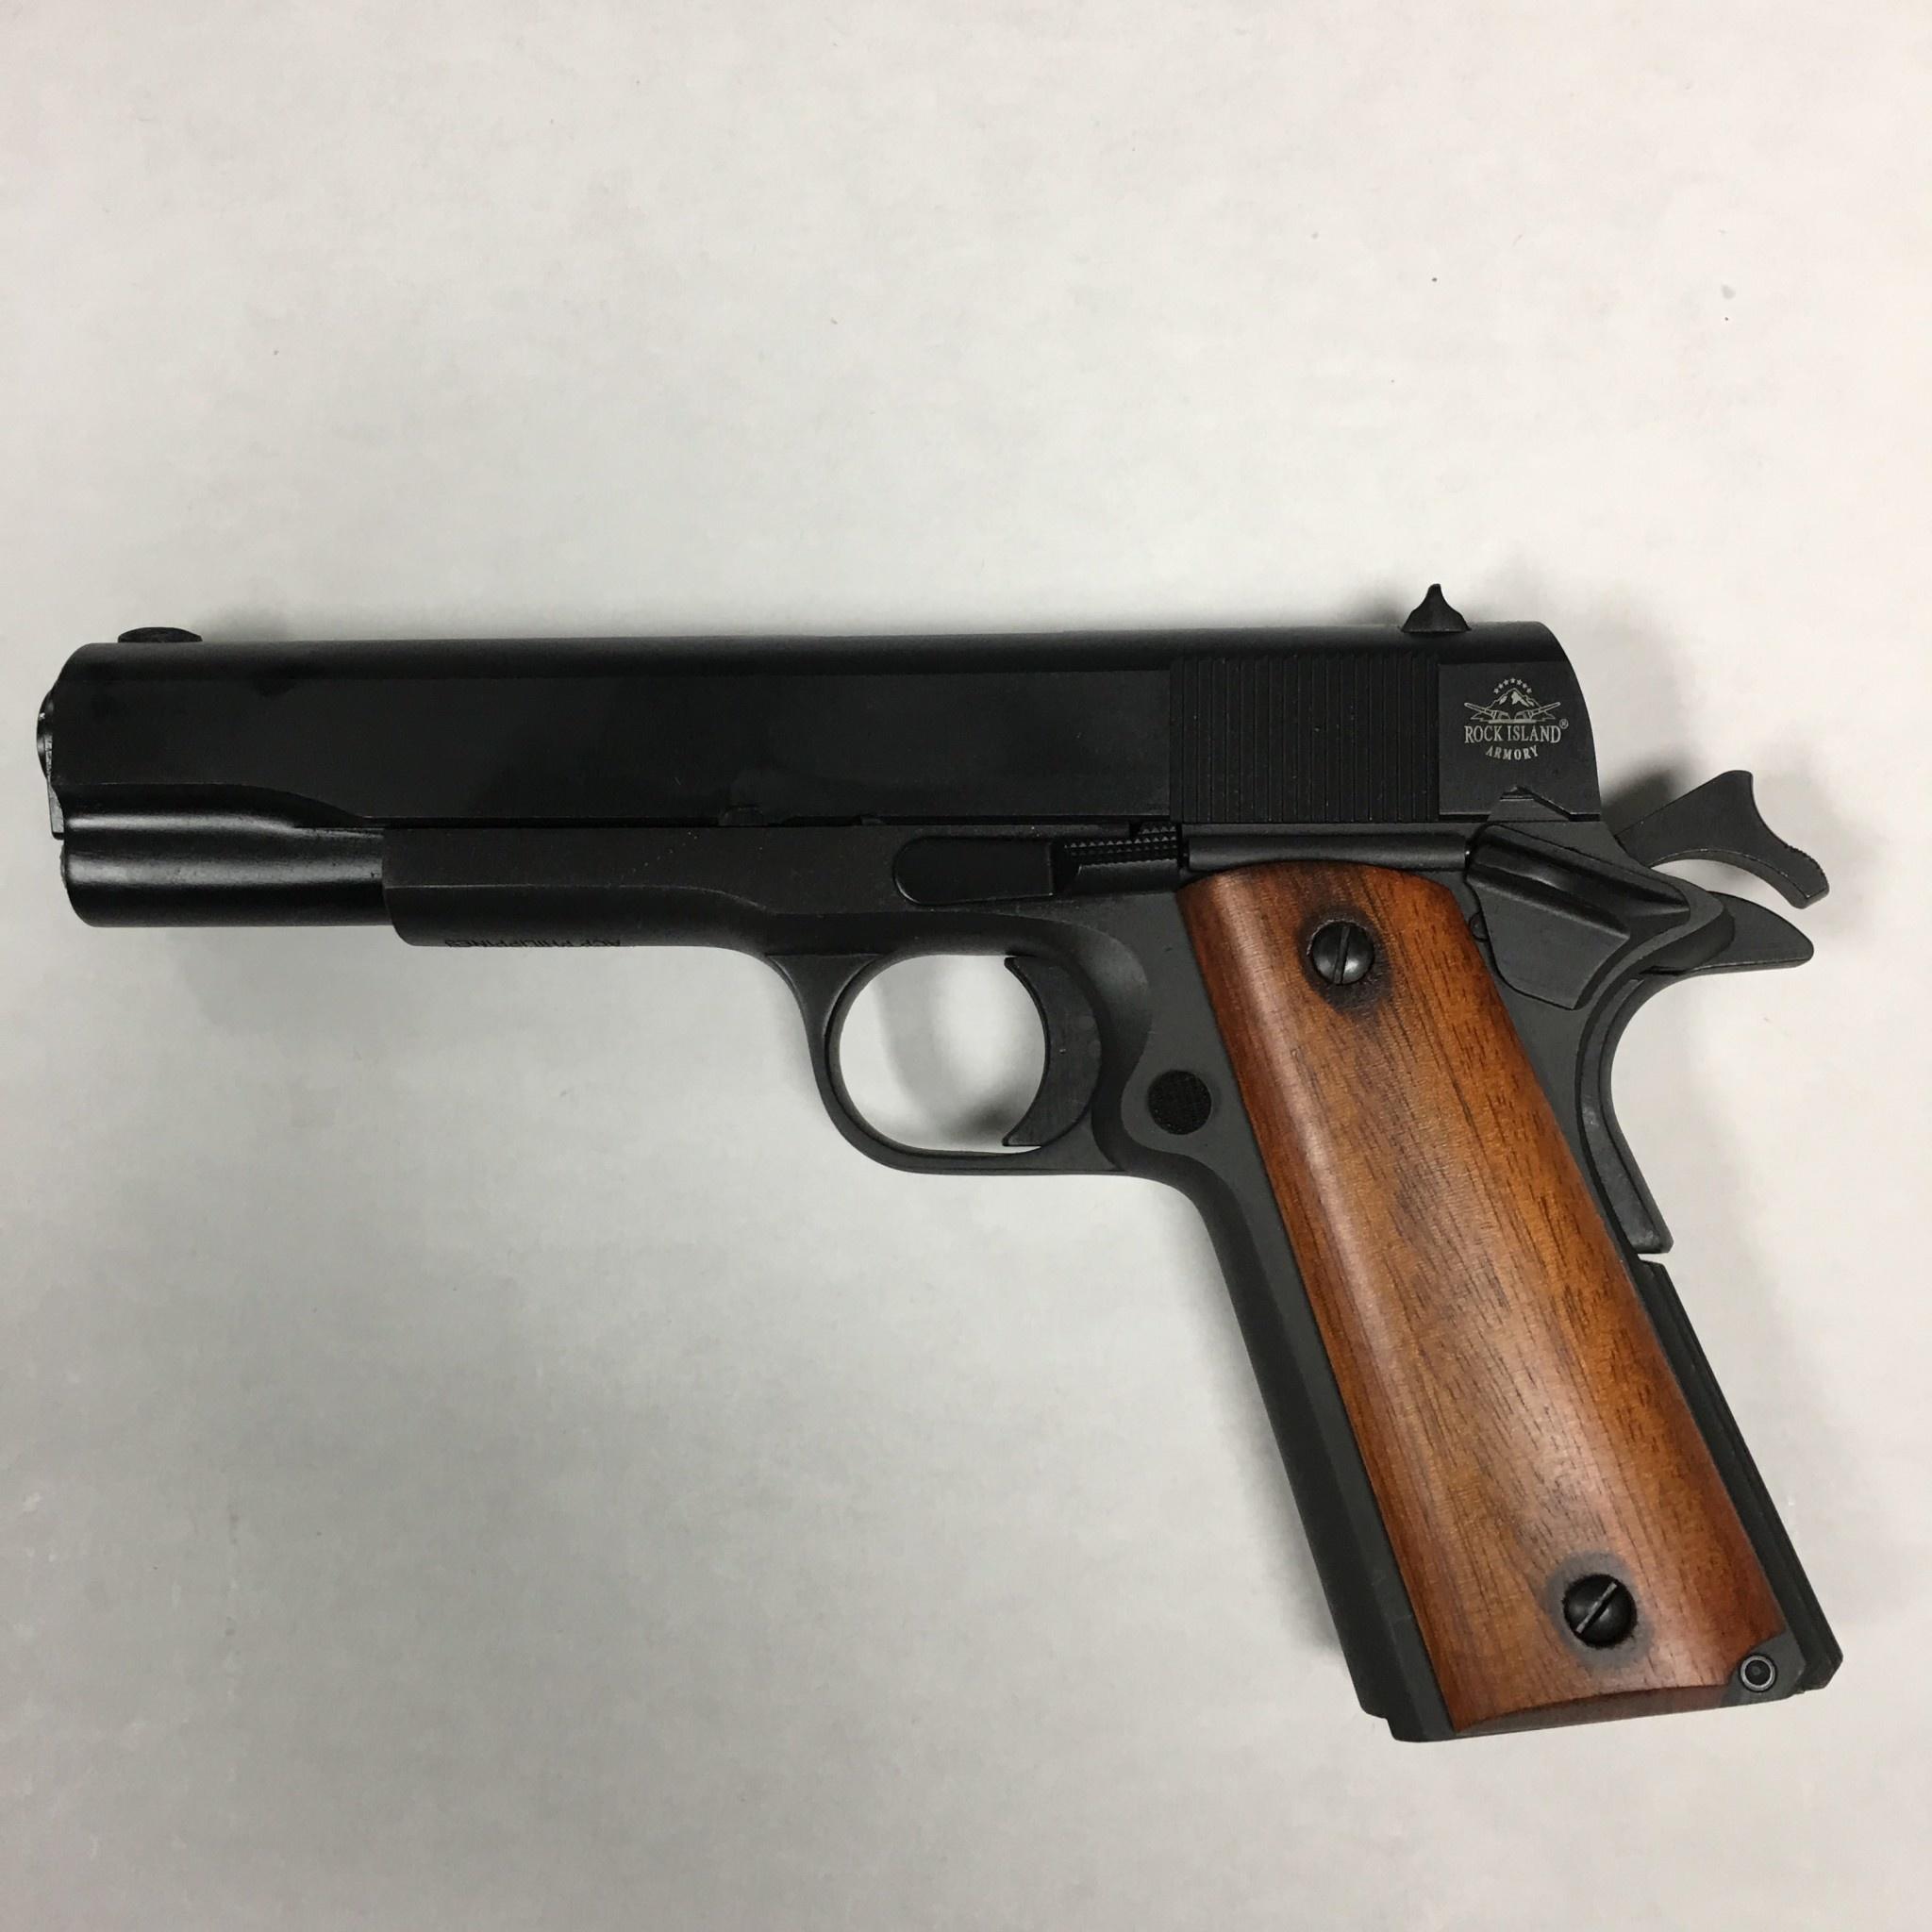 Rock Island M1911 A1-FS Pistol 45ACP